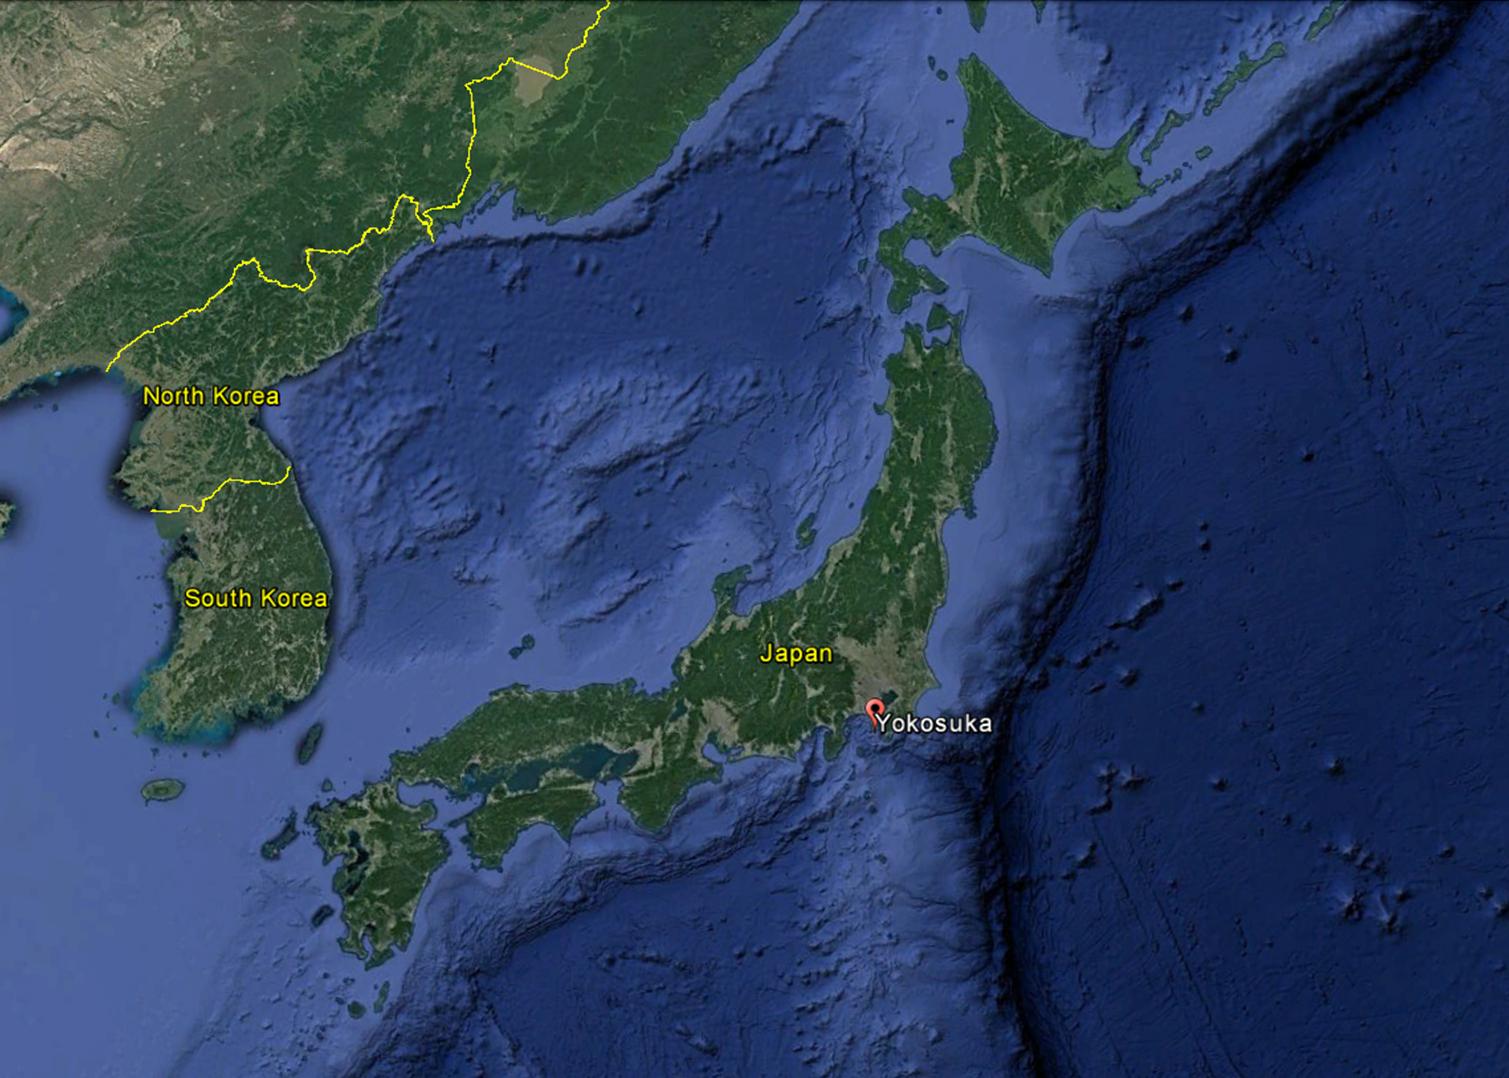 68 Years Ago Today Navcommunit 35 Yokosuka Japan Was Established